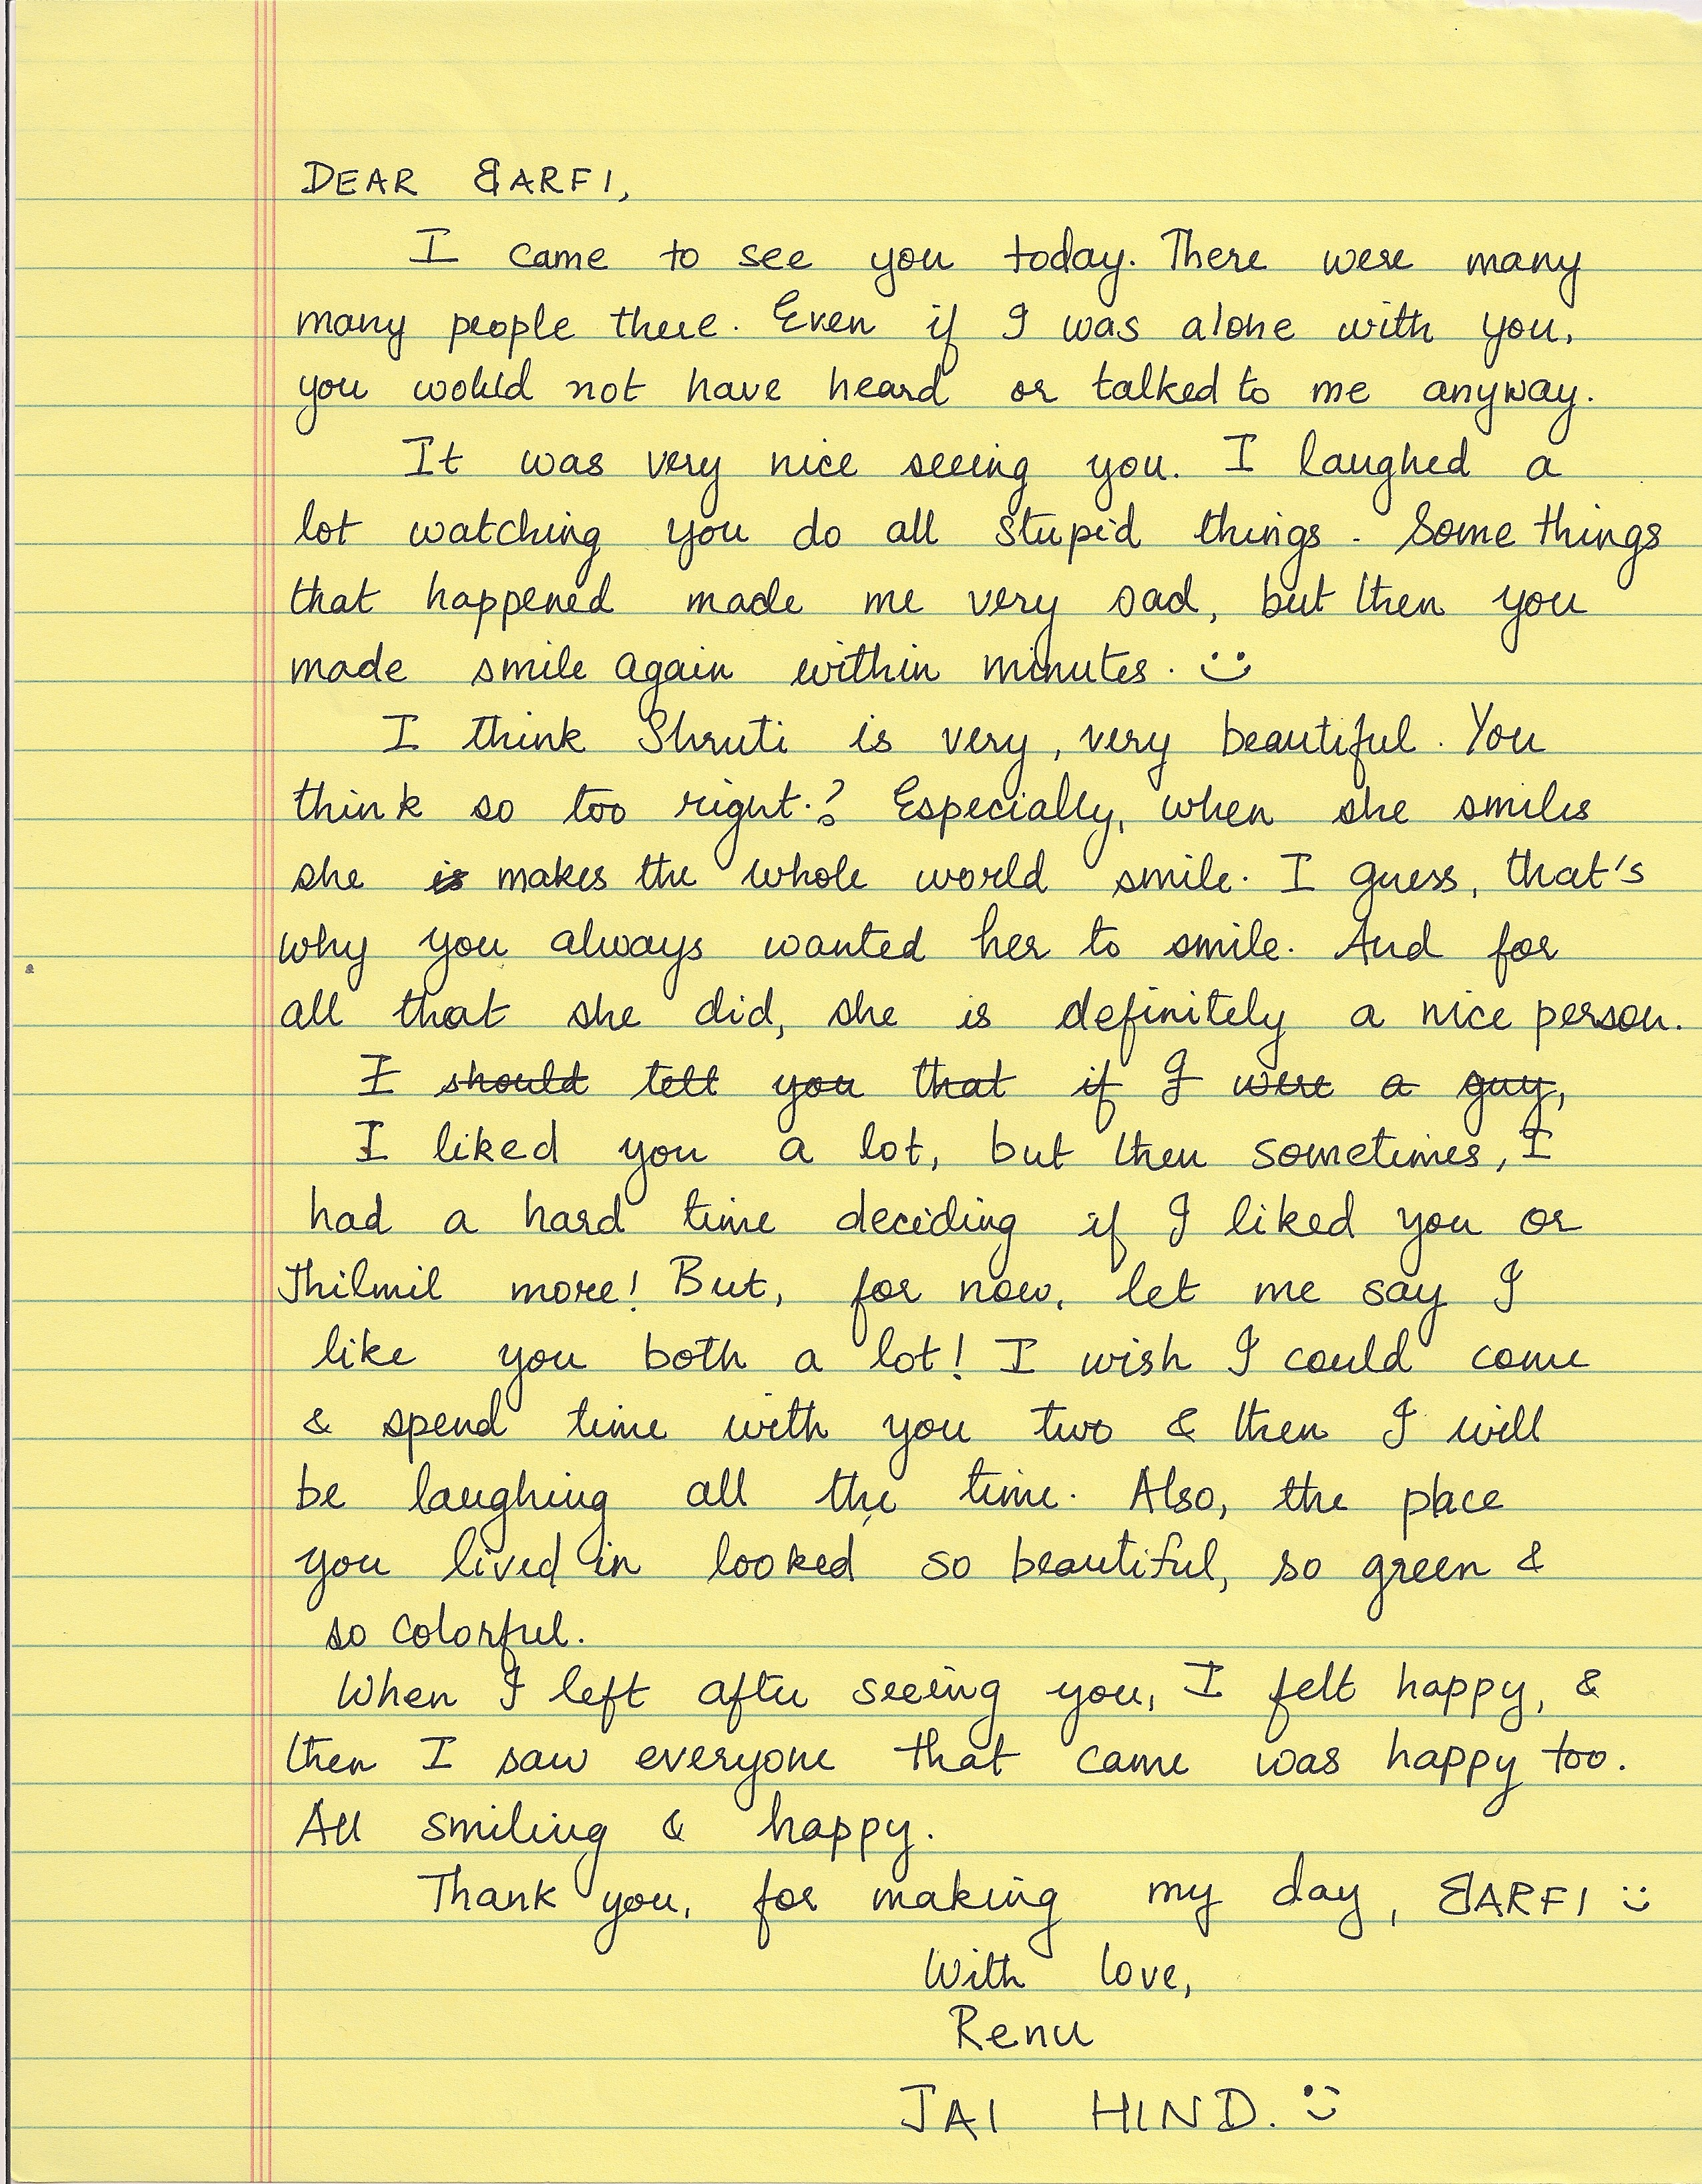 Sad letter to boyfriend